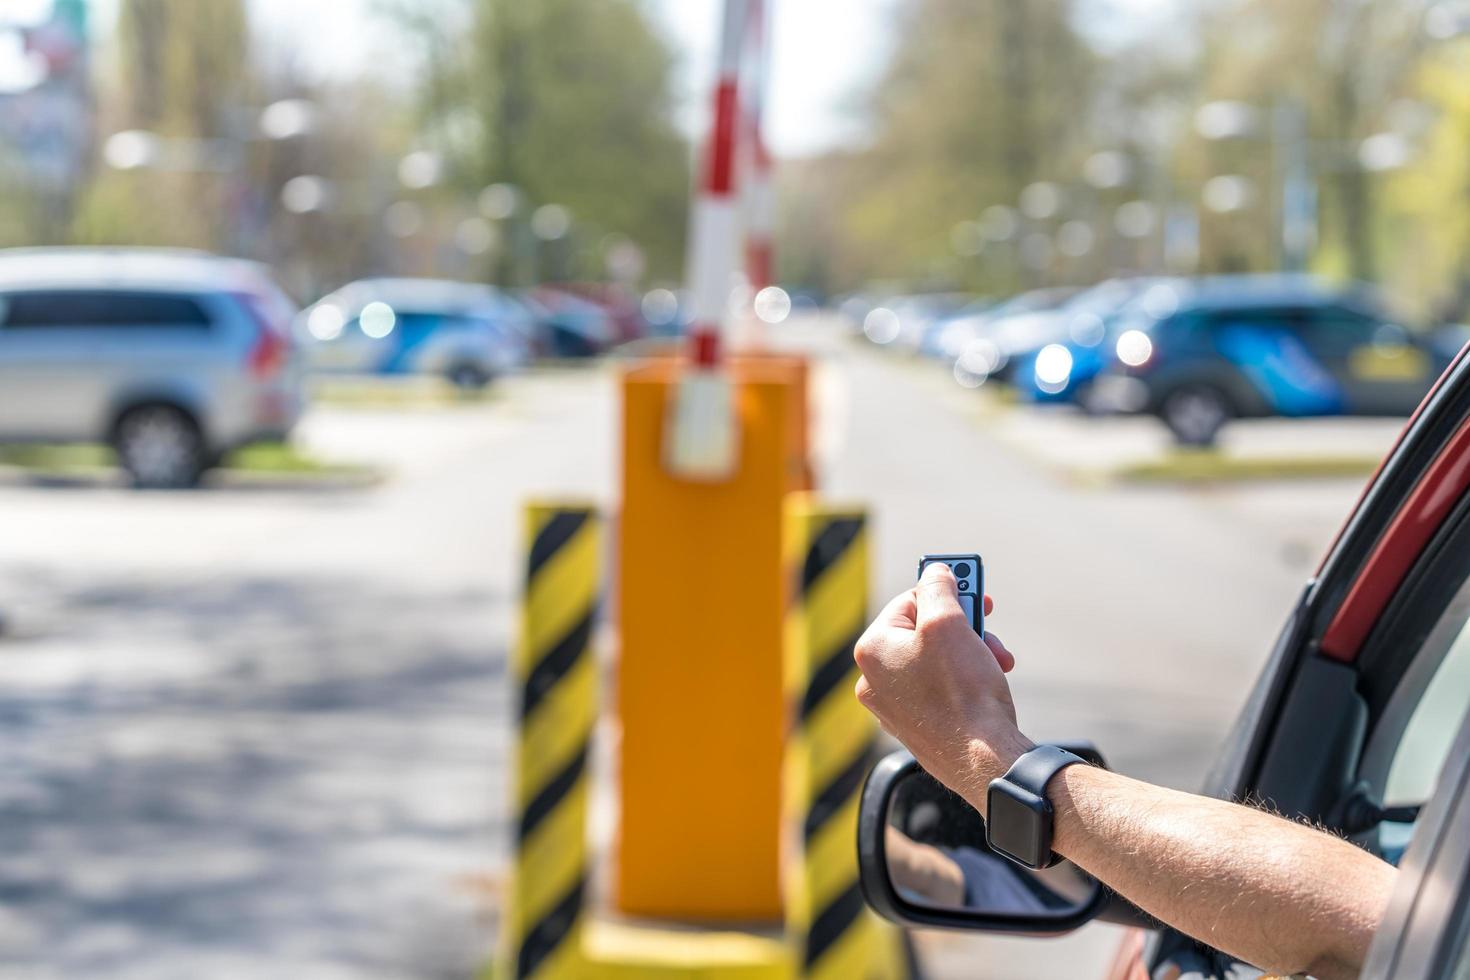 motorista de carro levanta barreira de estacionamento para sair do lote foto